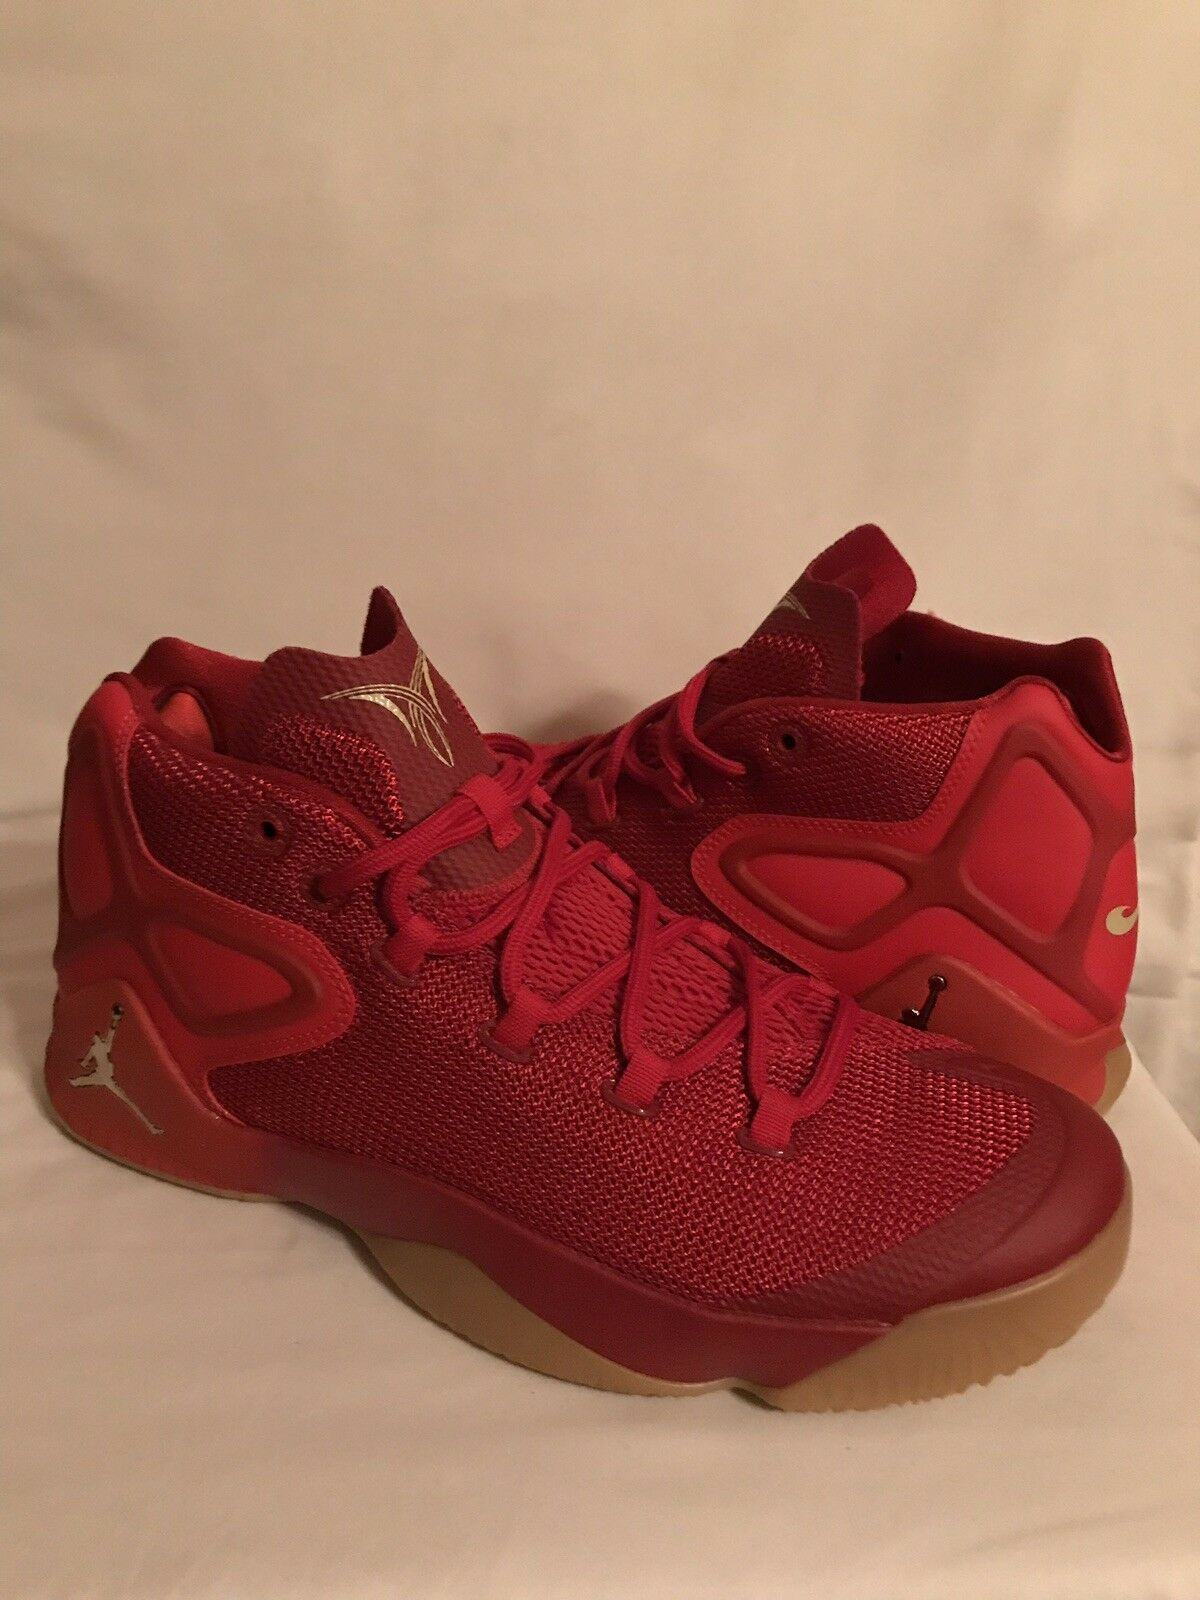 Nike air jordan basketball - schuhe mens fitness melo m12 rot